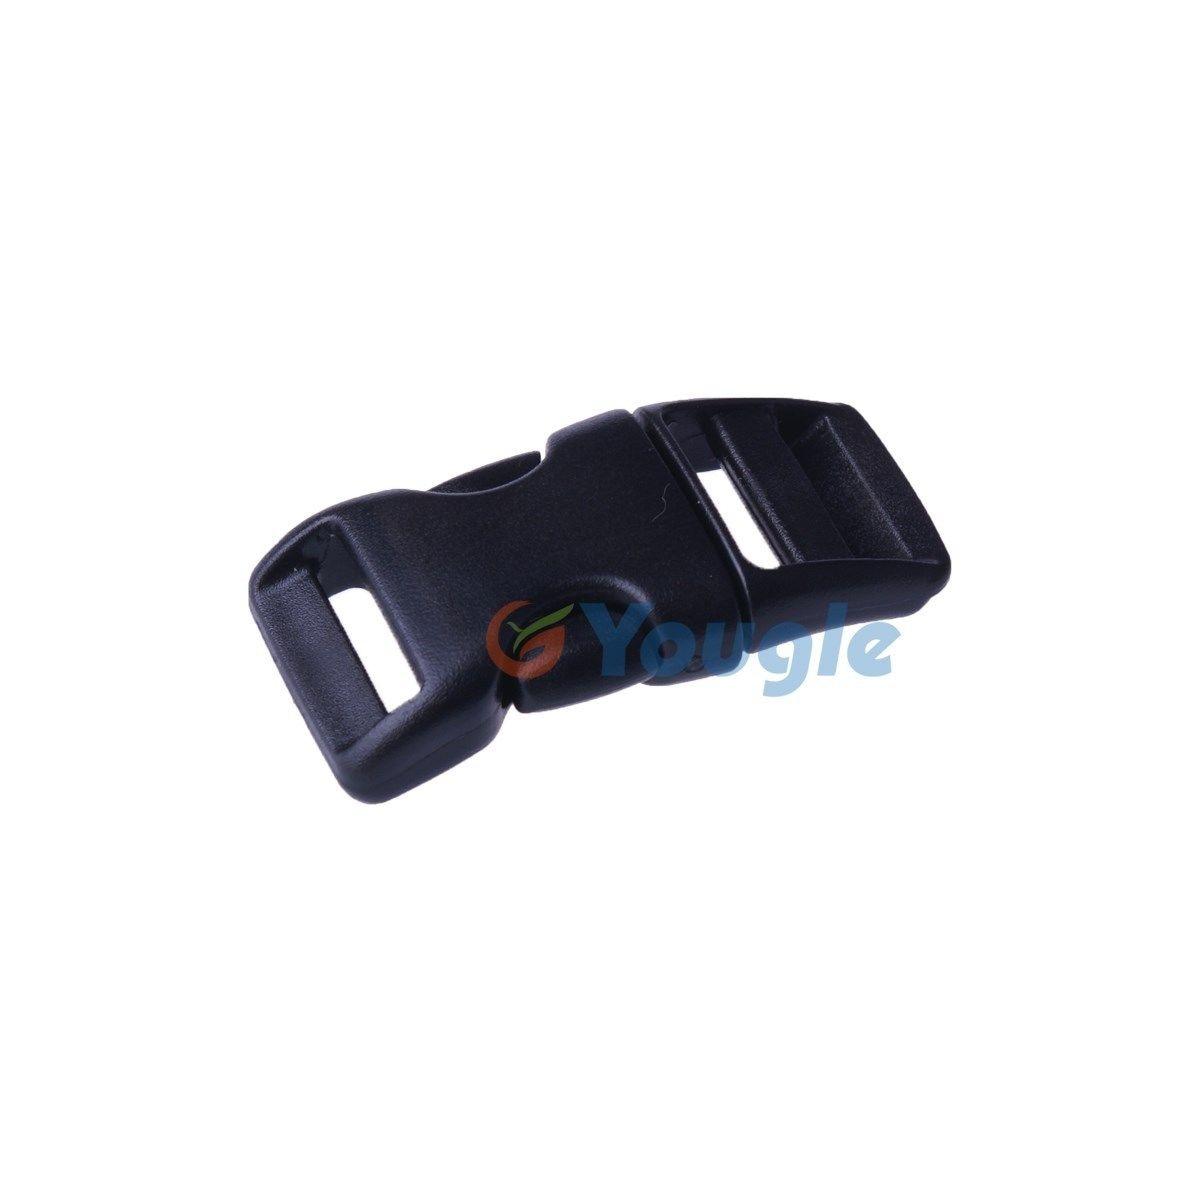 YOUGLE 10 Pieces 3/4'' Webbing Paracord Bracelet PLASTIC BUCKLE Side Released Black/Khaki